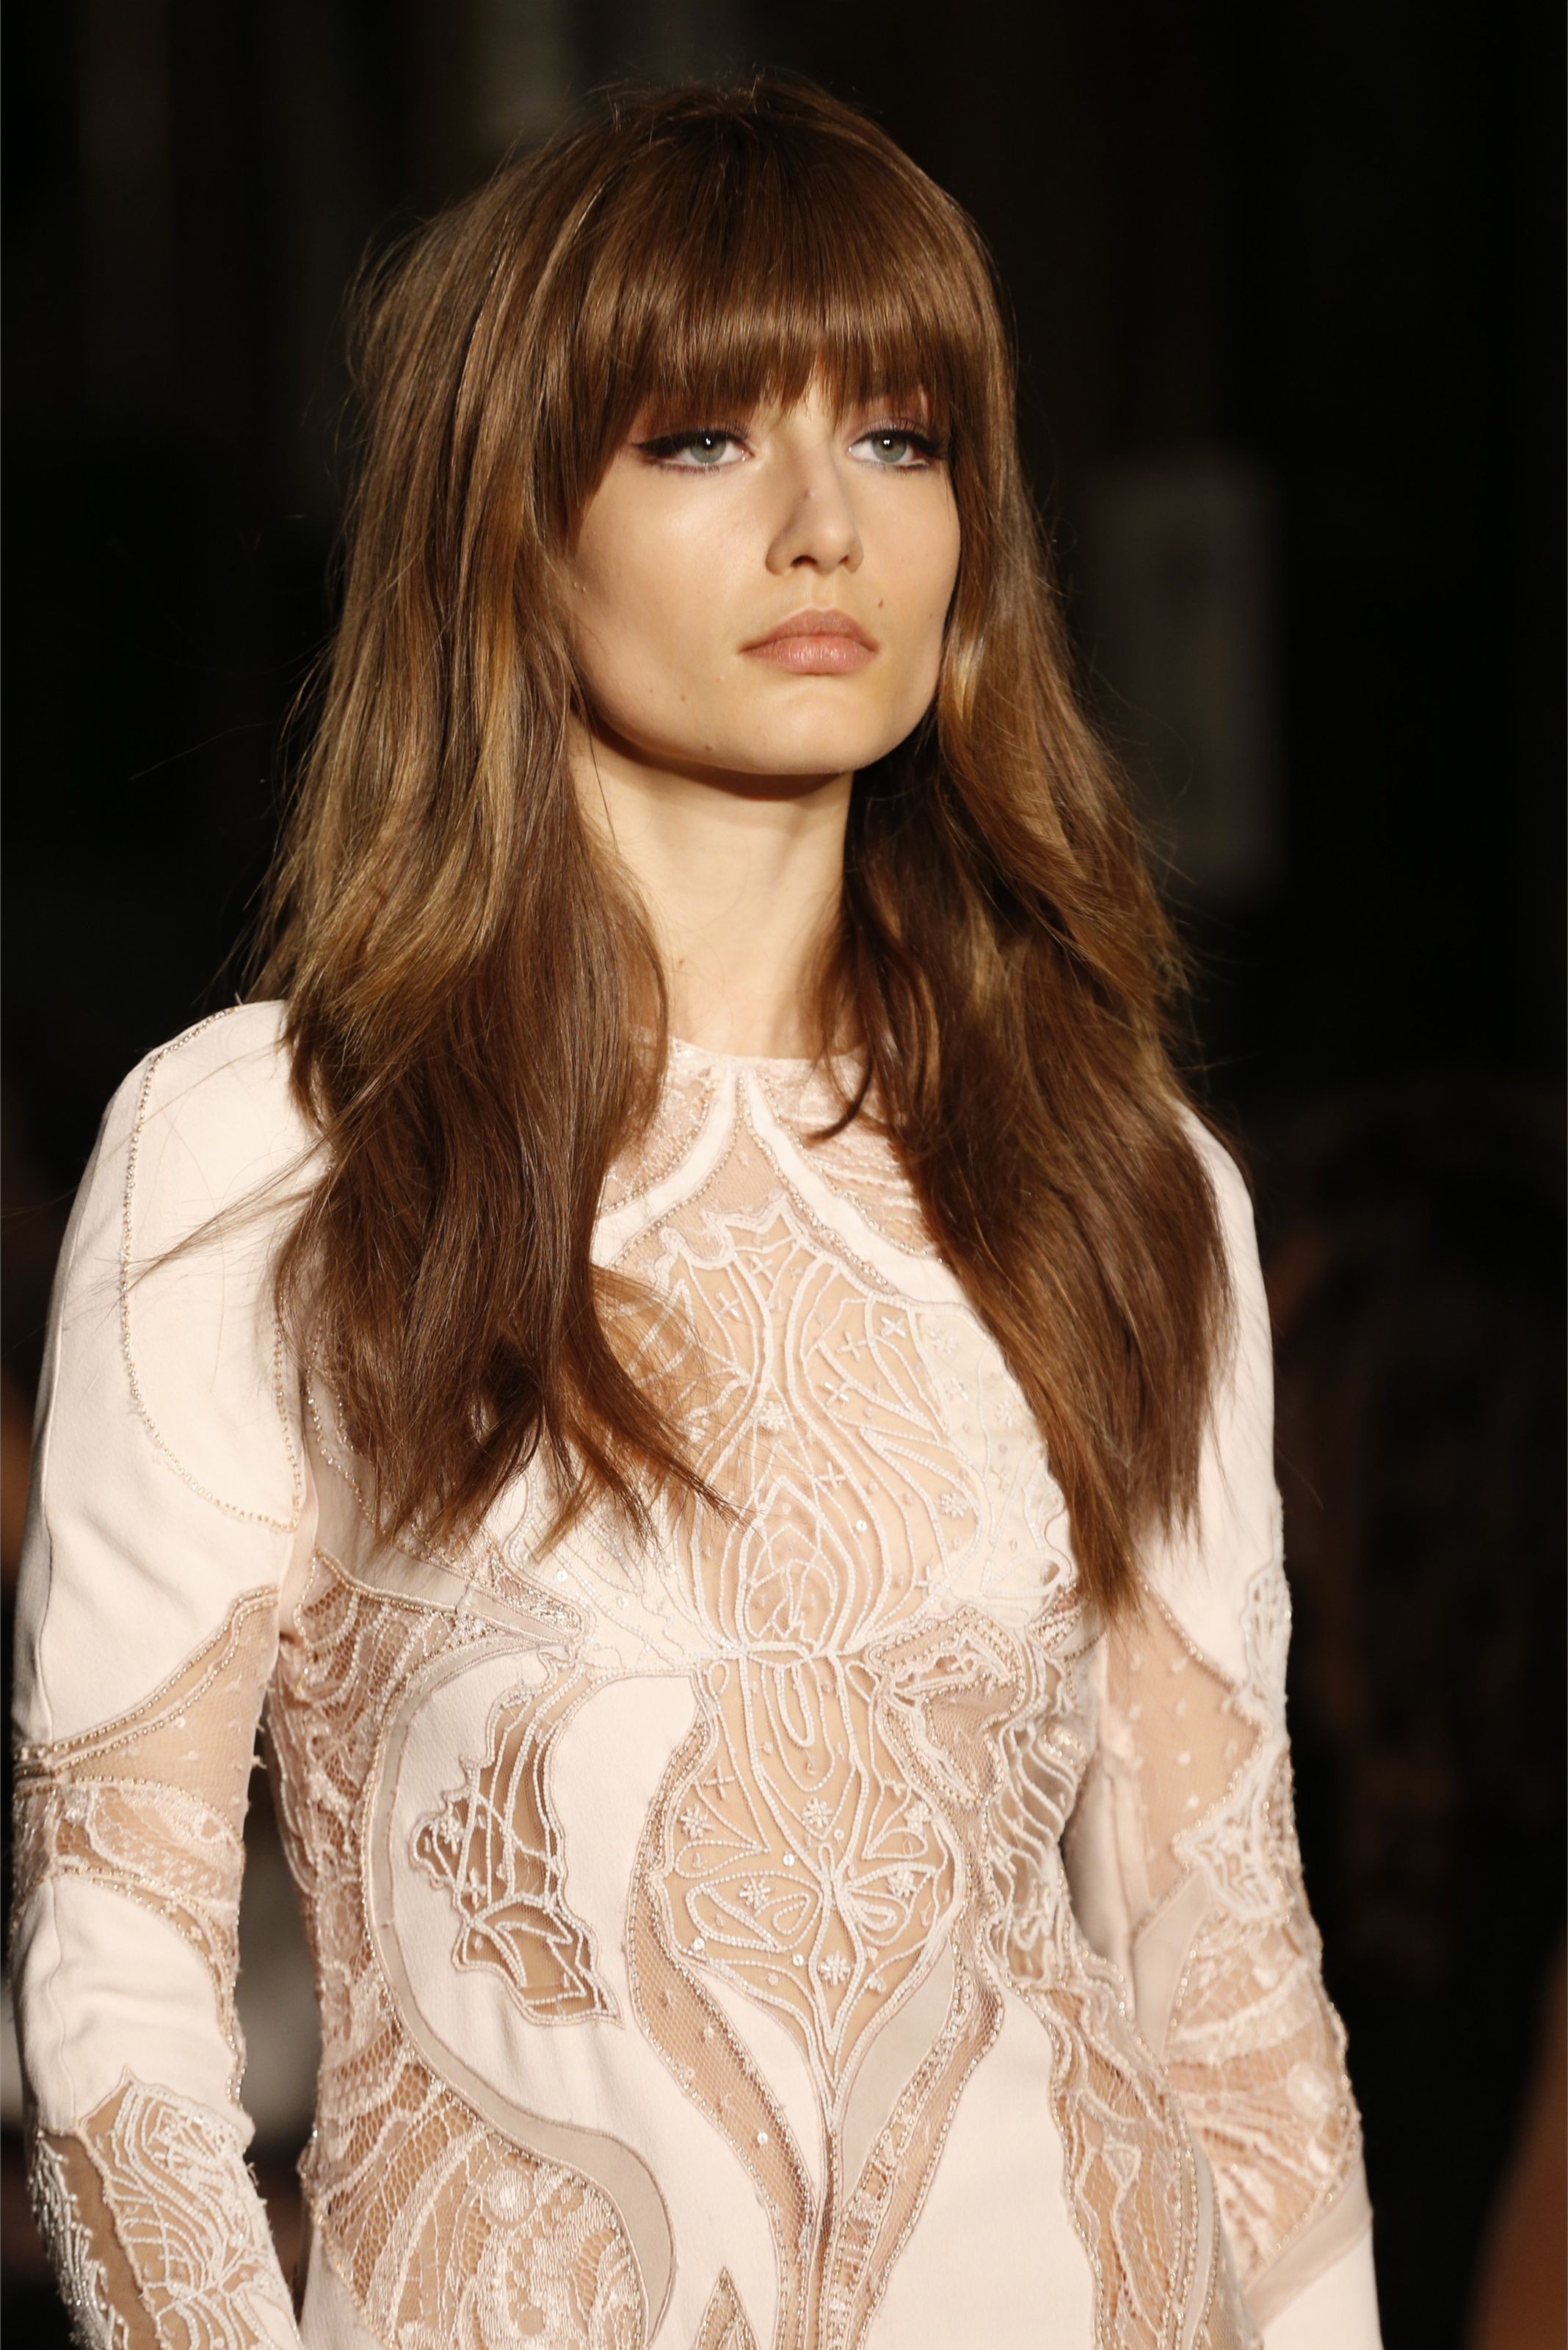 Moda Sfilate E Tendenze Hair Styles Long Hair Styles Hairstyles With Bangs